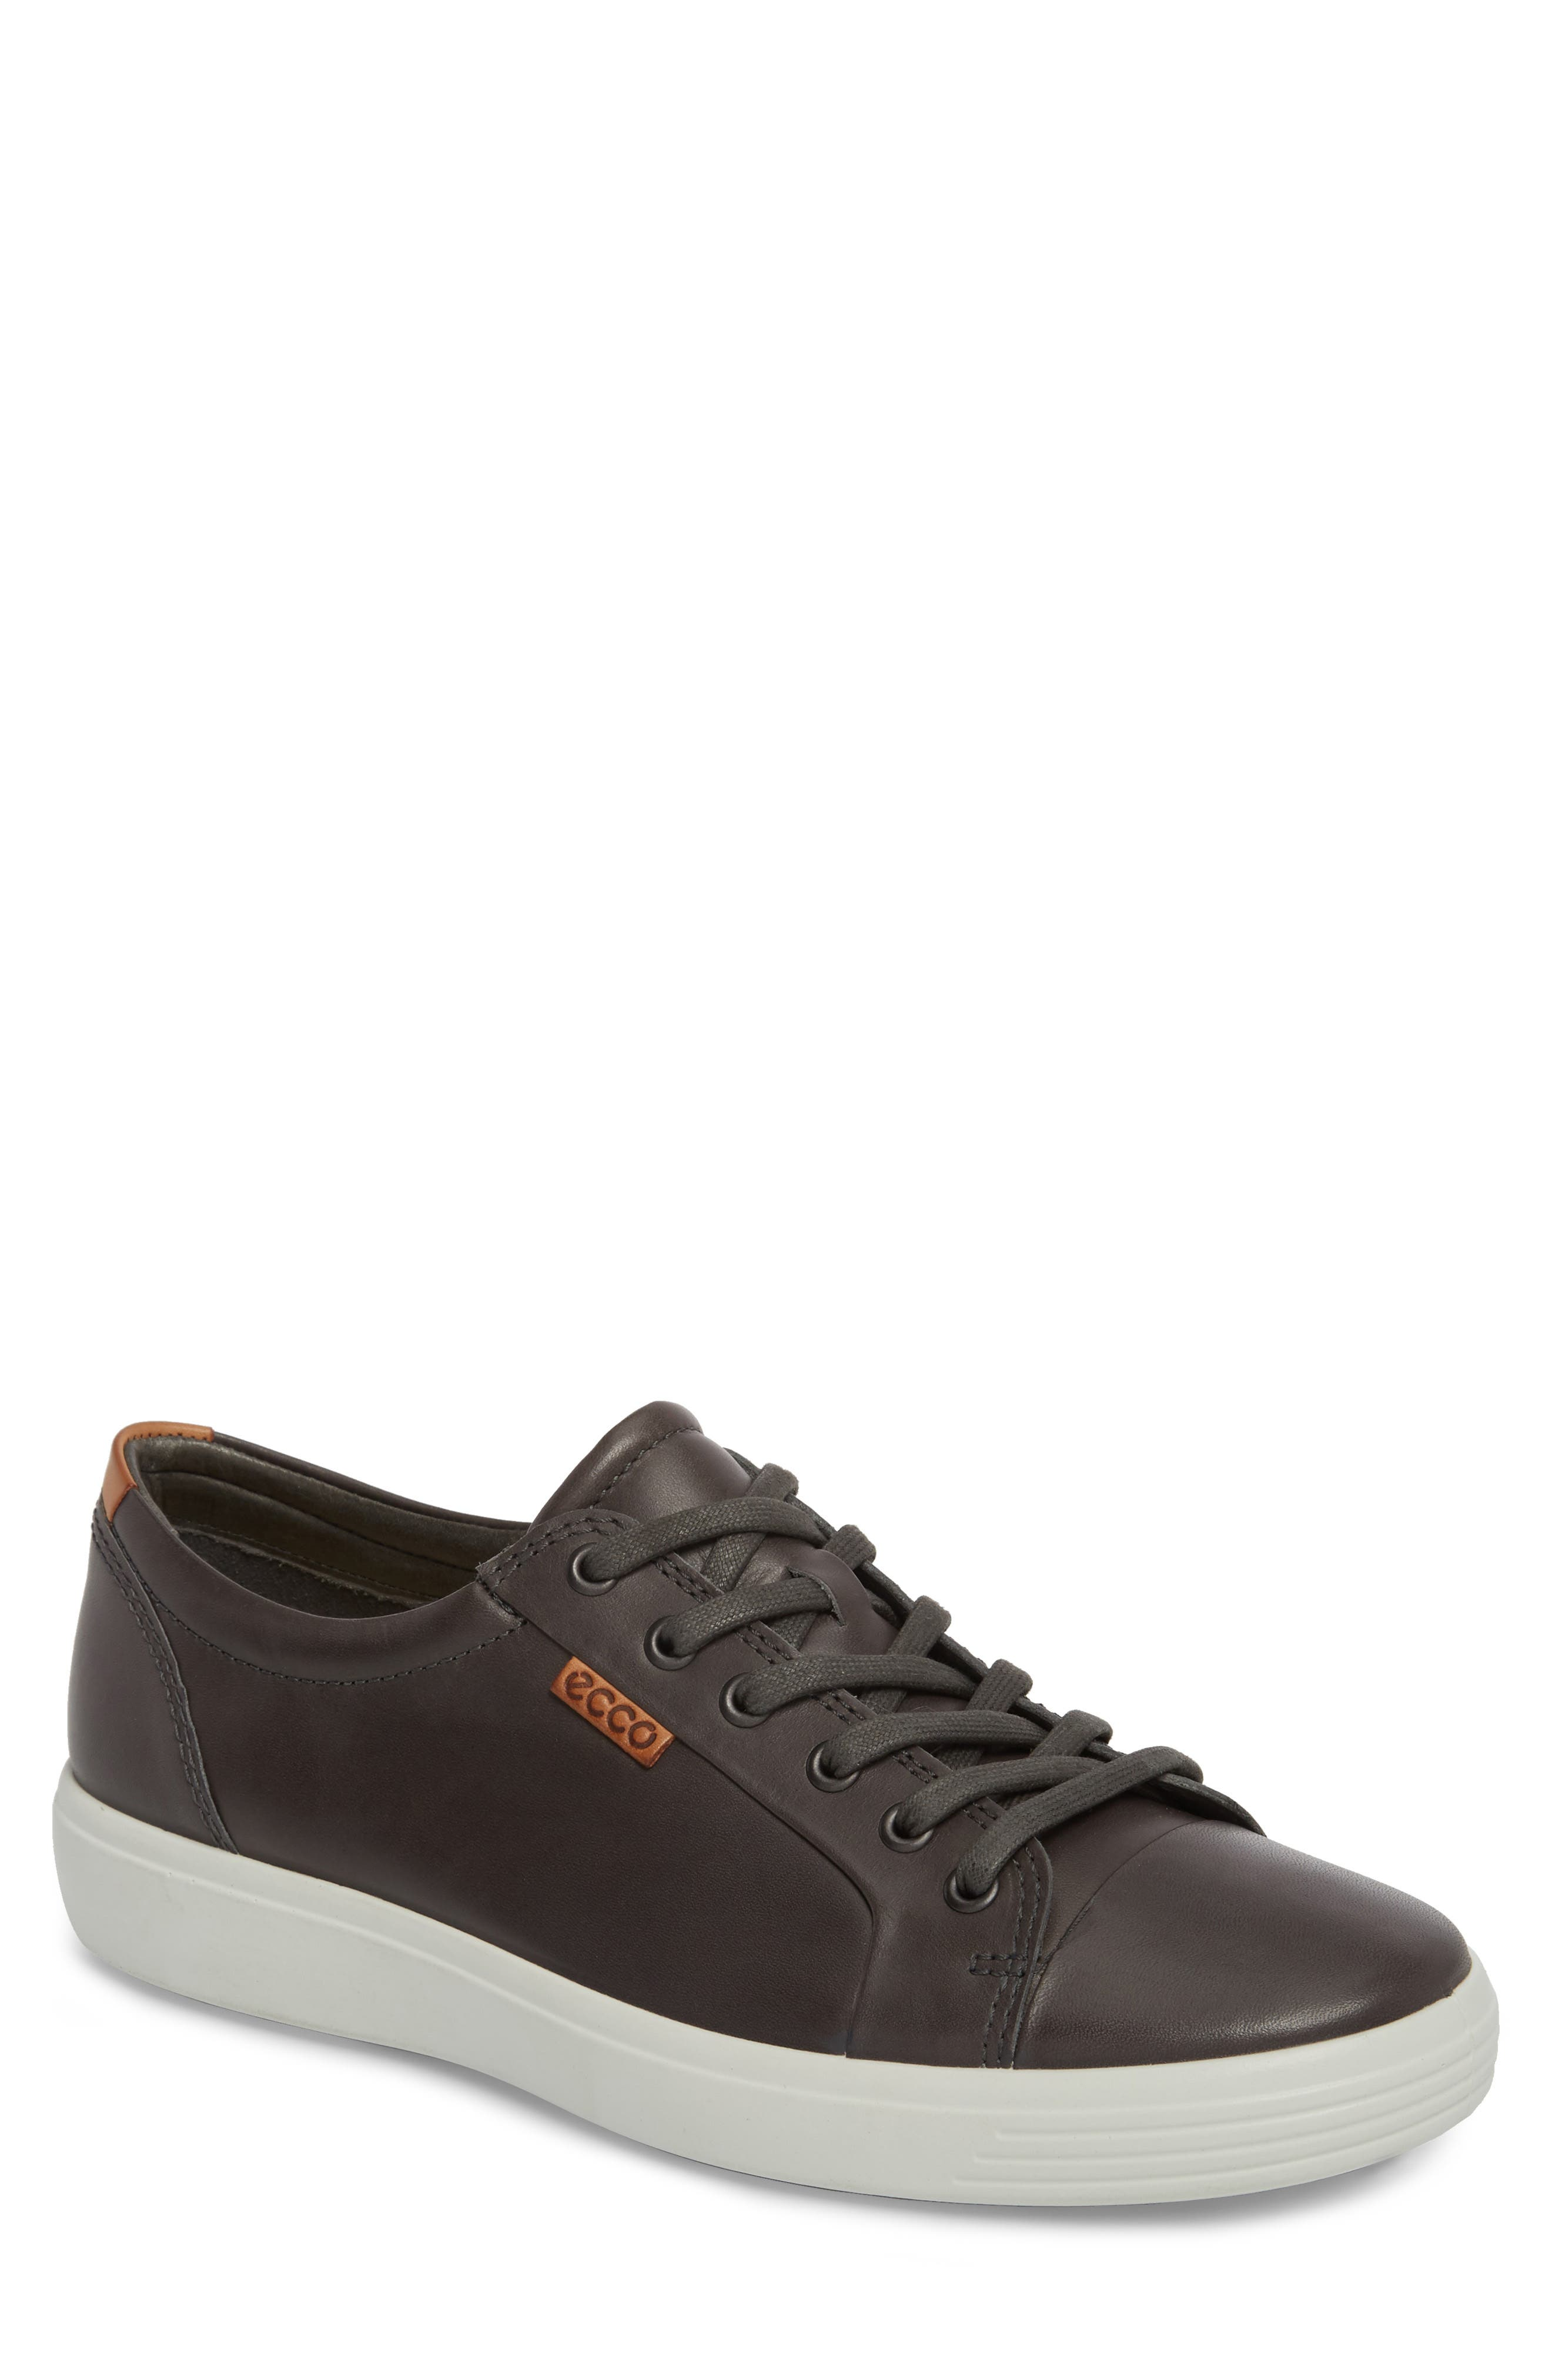 ECCOSoft VII Lace-Up Sneaker (Men)